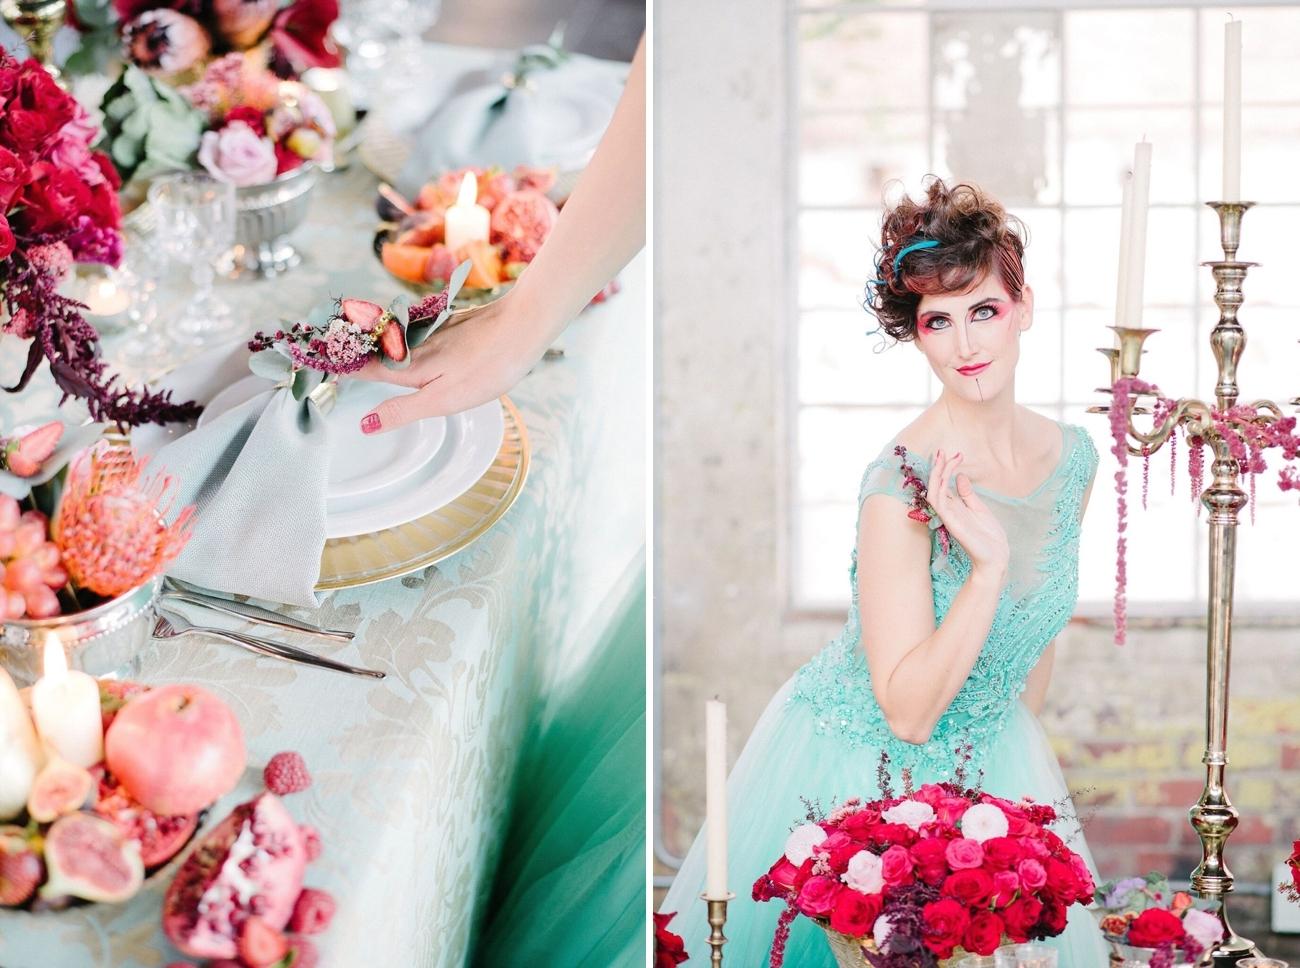 Hunger Games Wedding Inspiration | SouthBound Bride